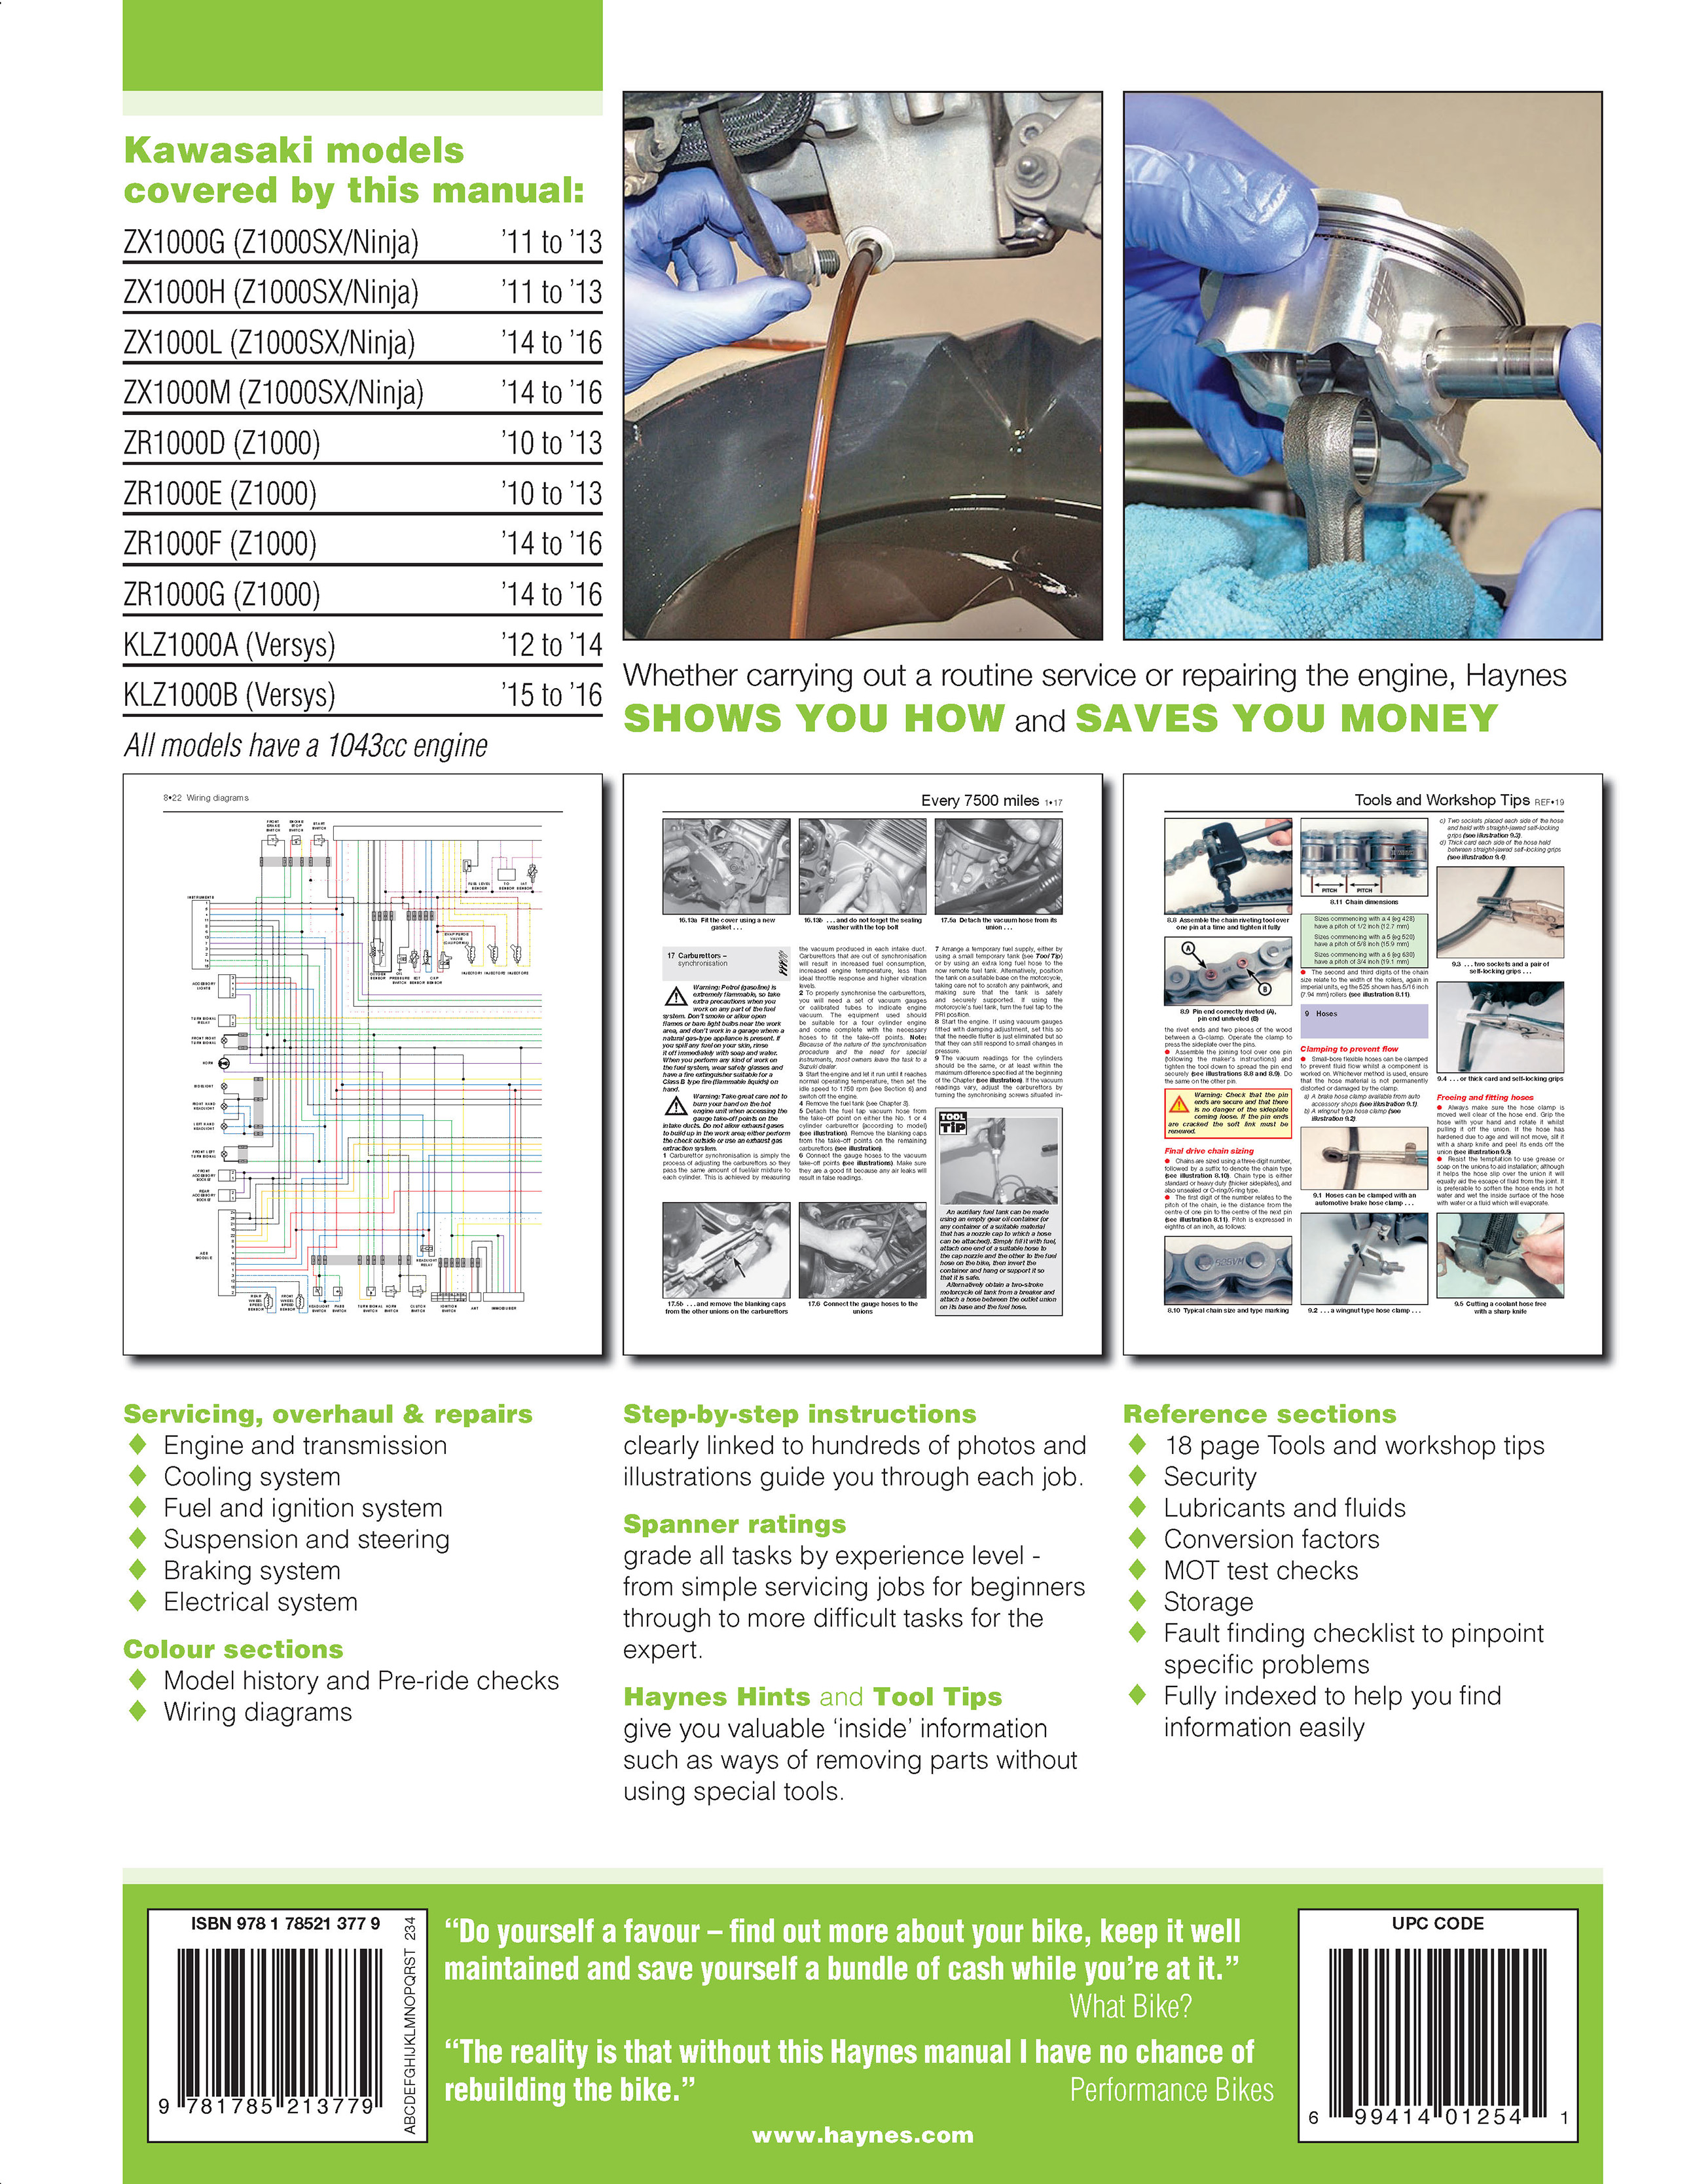 z1000 wiring diagram 20 wiring diagram images wiring 3-Way Switch Wiring Diagram Residential Electrical Wiring Diagrams